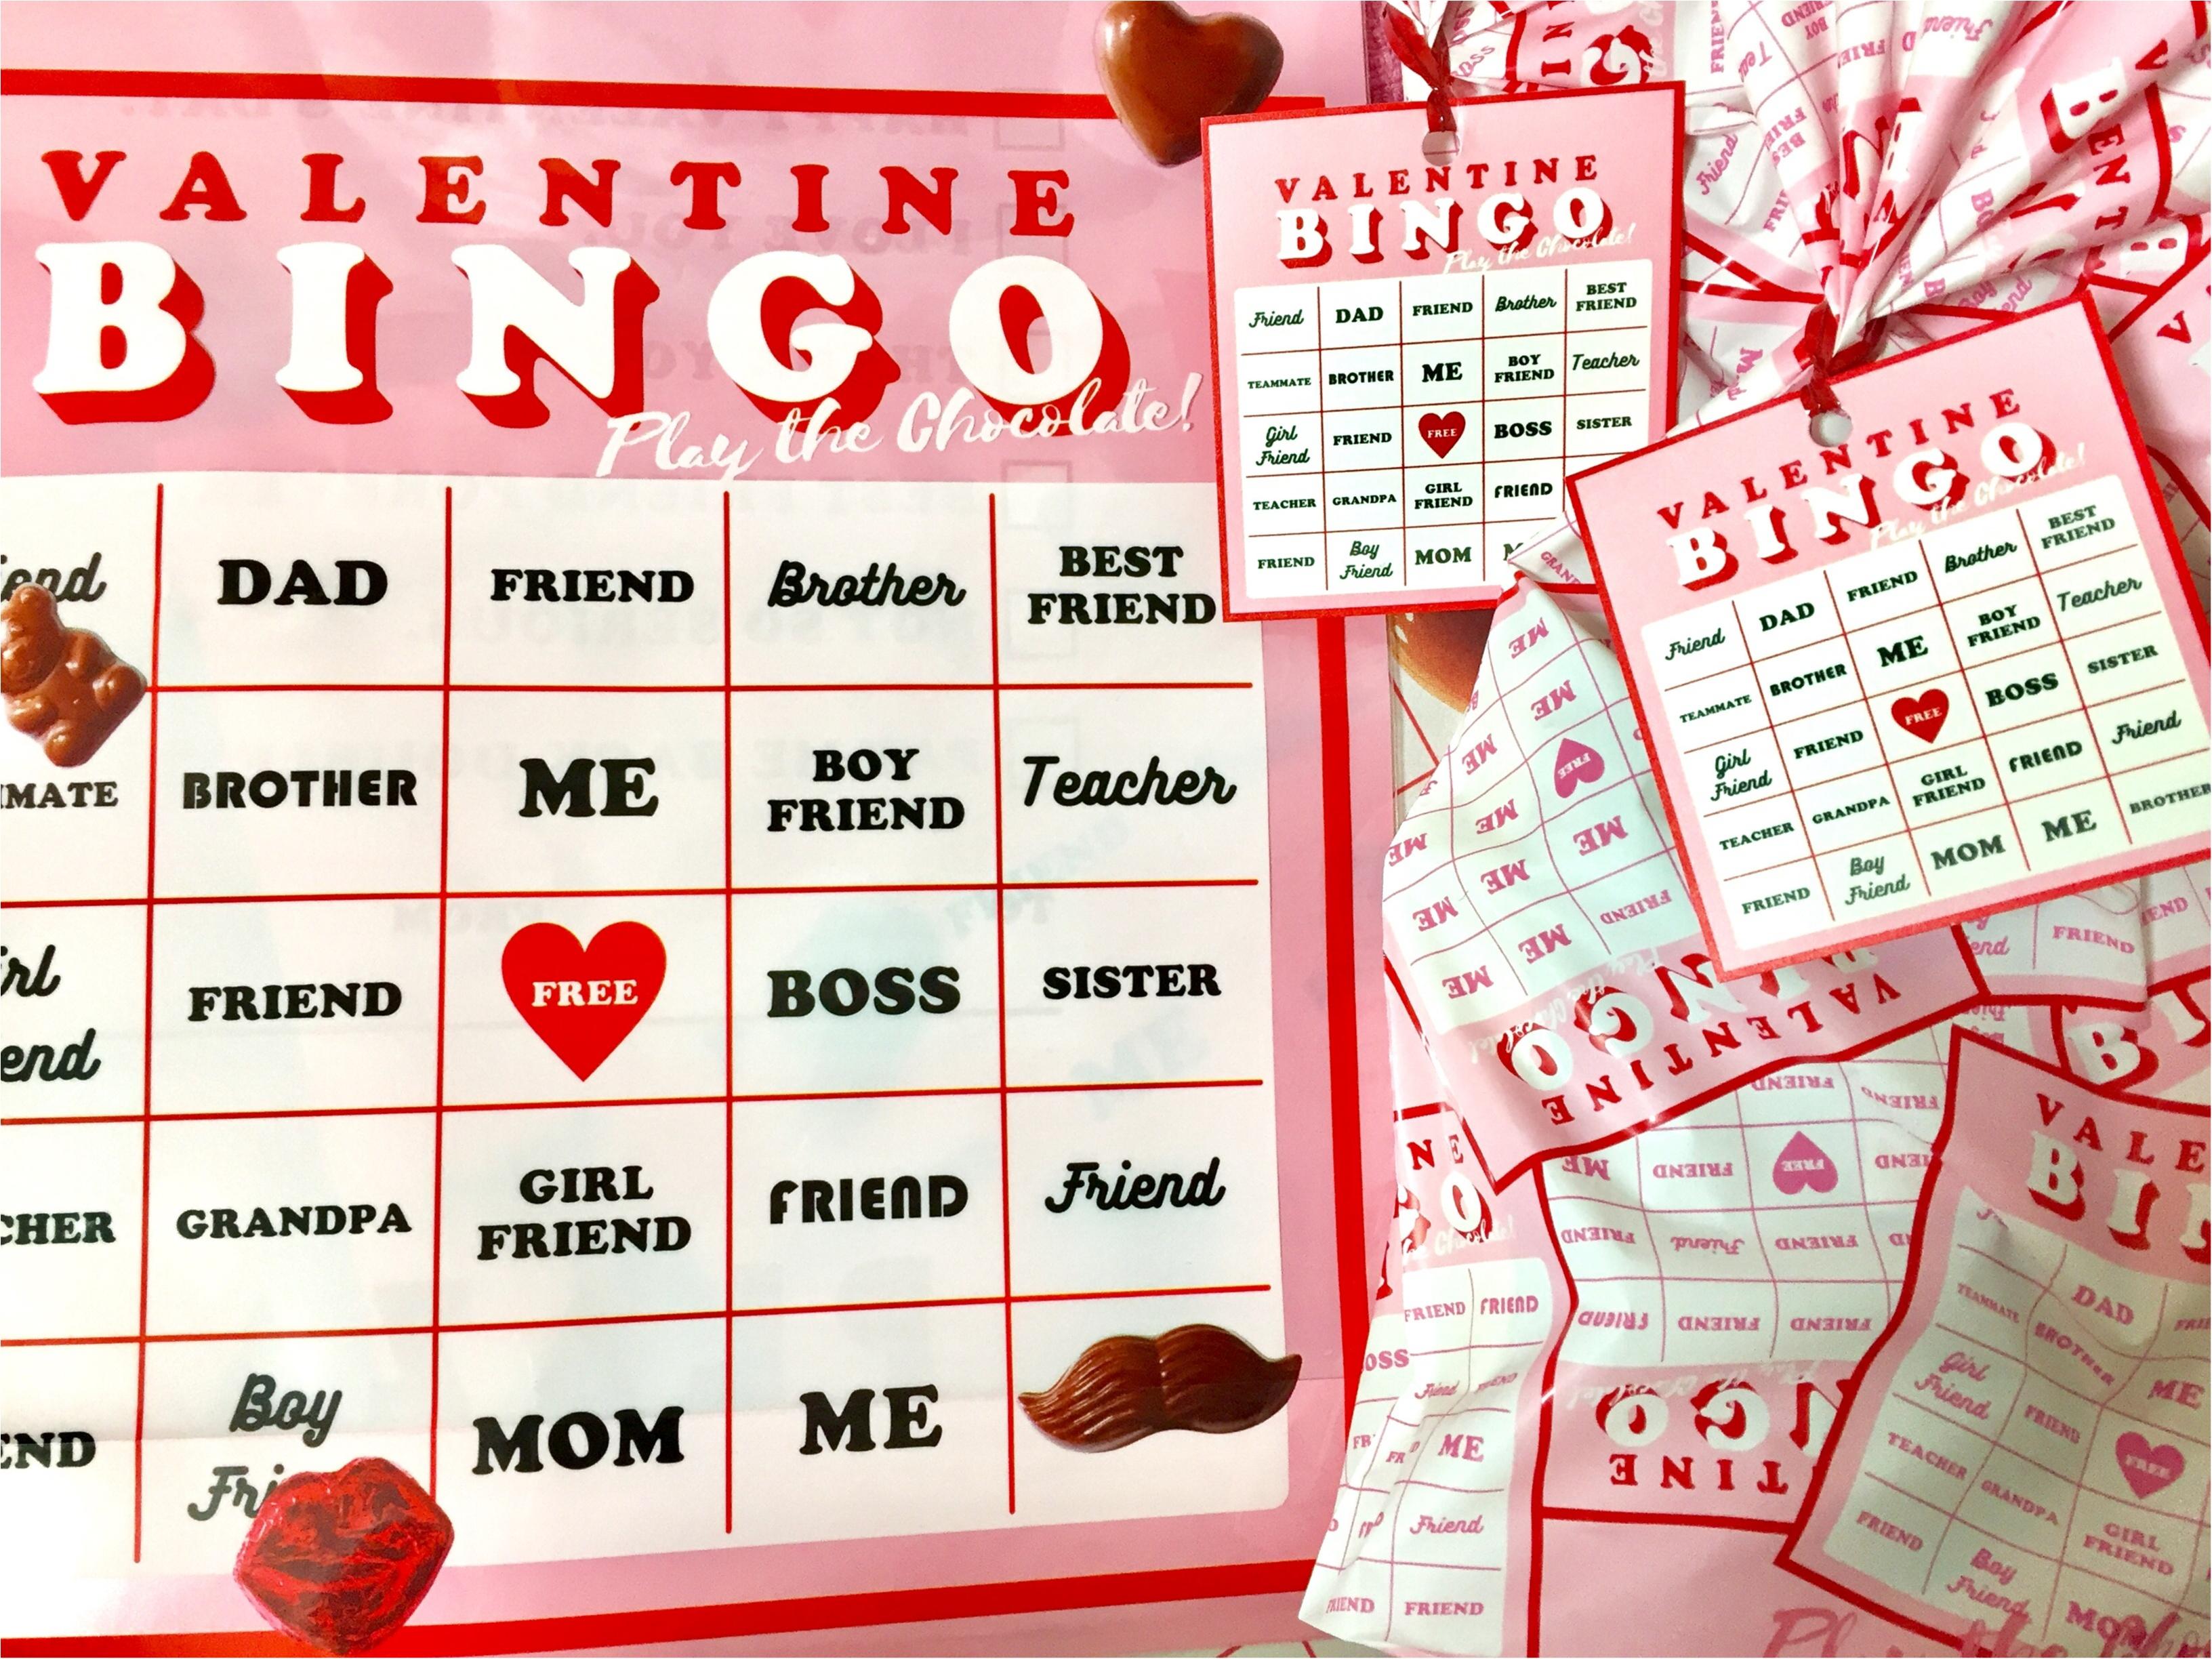 【Shopping】話題沸騰中!無料でもらえる?!PLAZAのバレンタインが可愛すぎる♡!_4